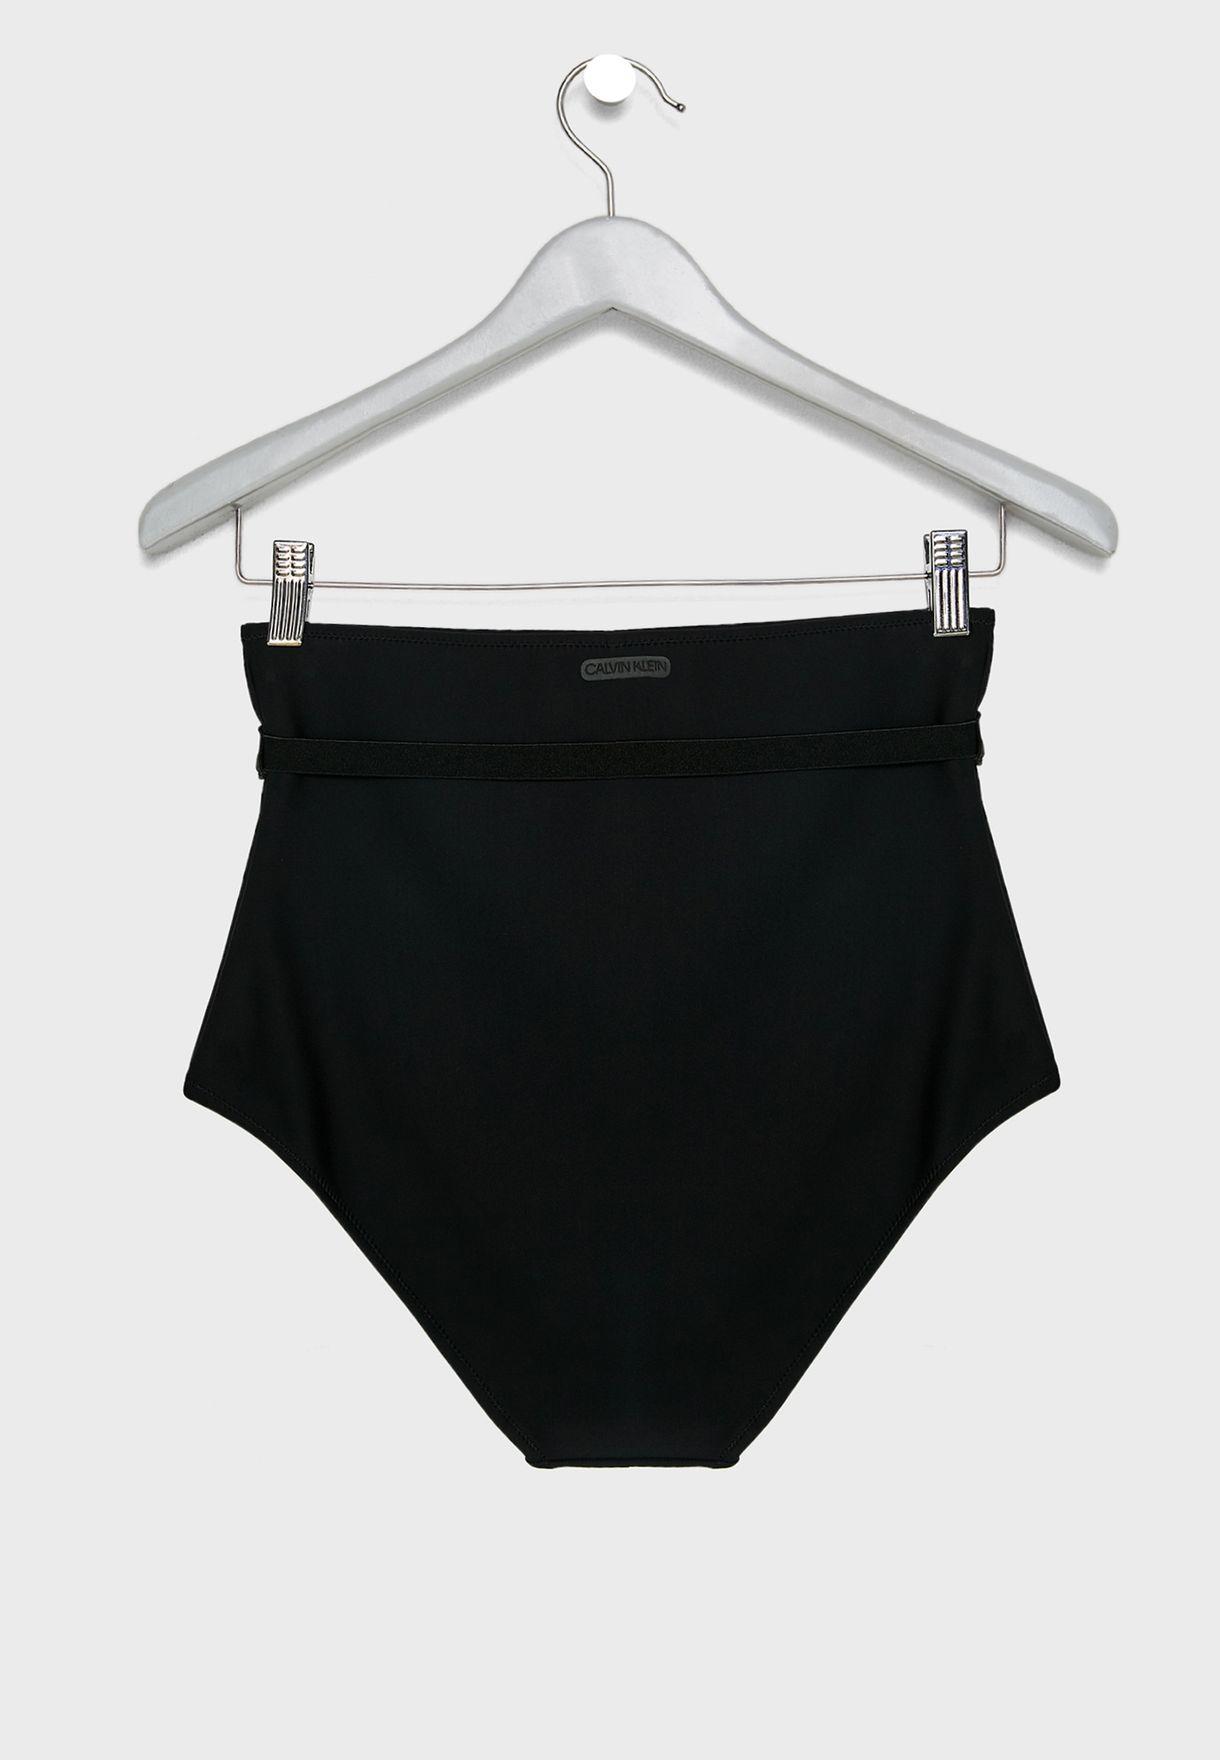 803c67519fb2c Shop Calvin Klein black High Waisted Bikini Bottom KW0KW00507 for ...